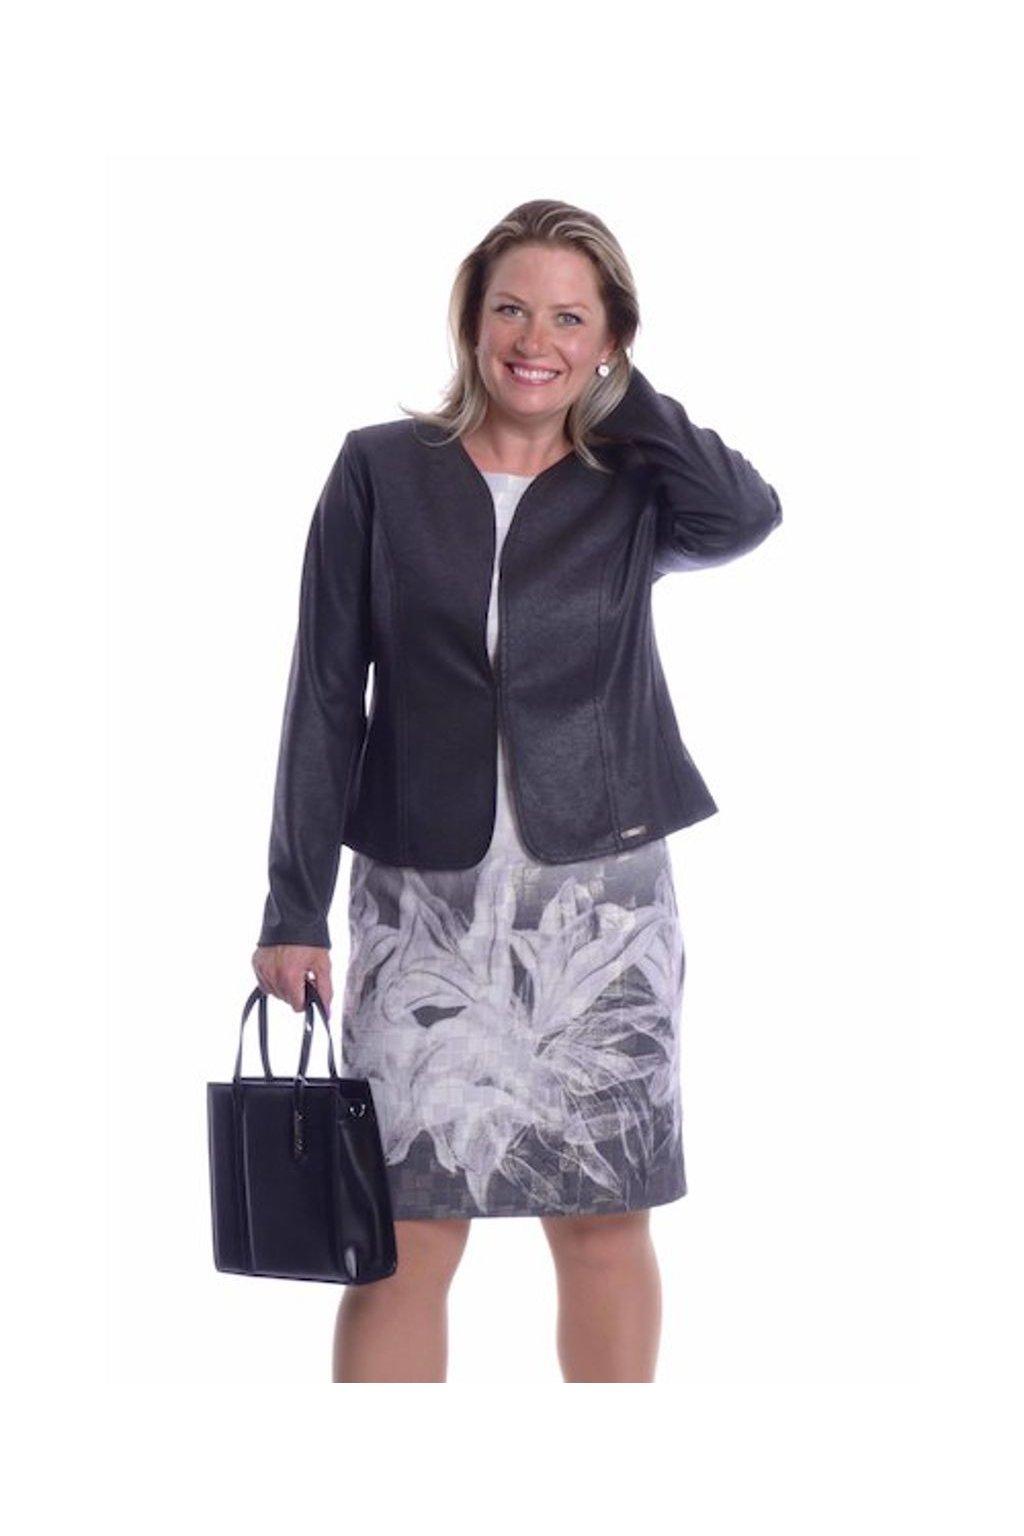 61T Kabátek Silueta (Velikost 36, Barva Černá)